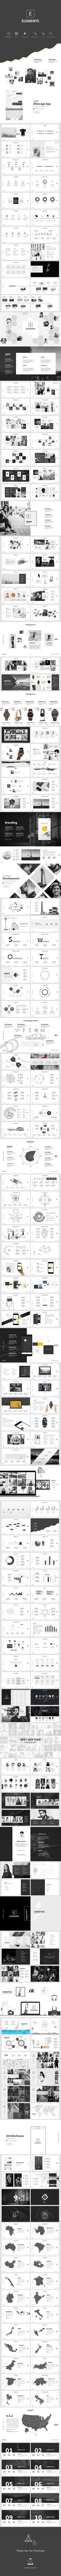 Elements - Multipurpose Business Portfolio Presentation Template